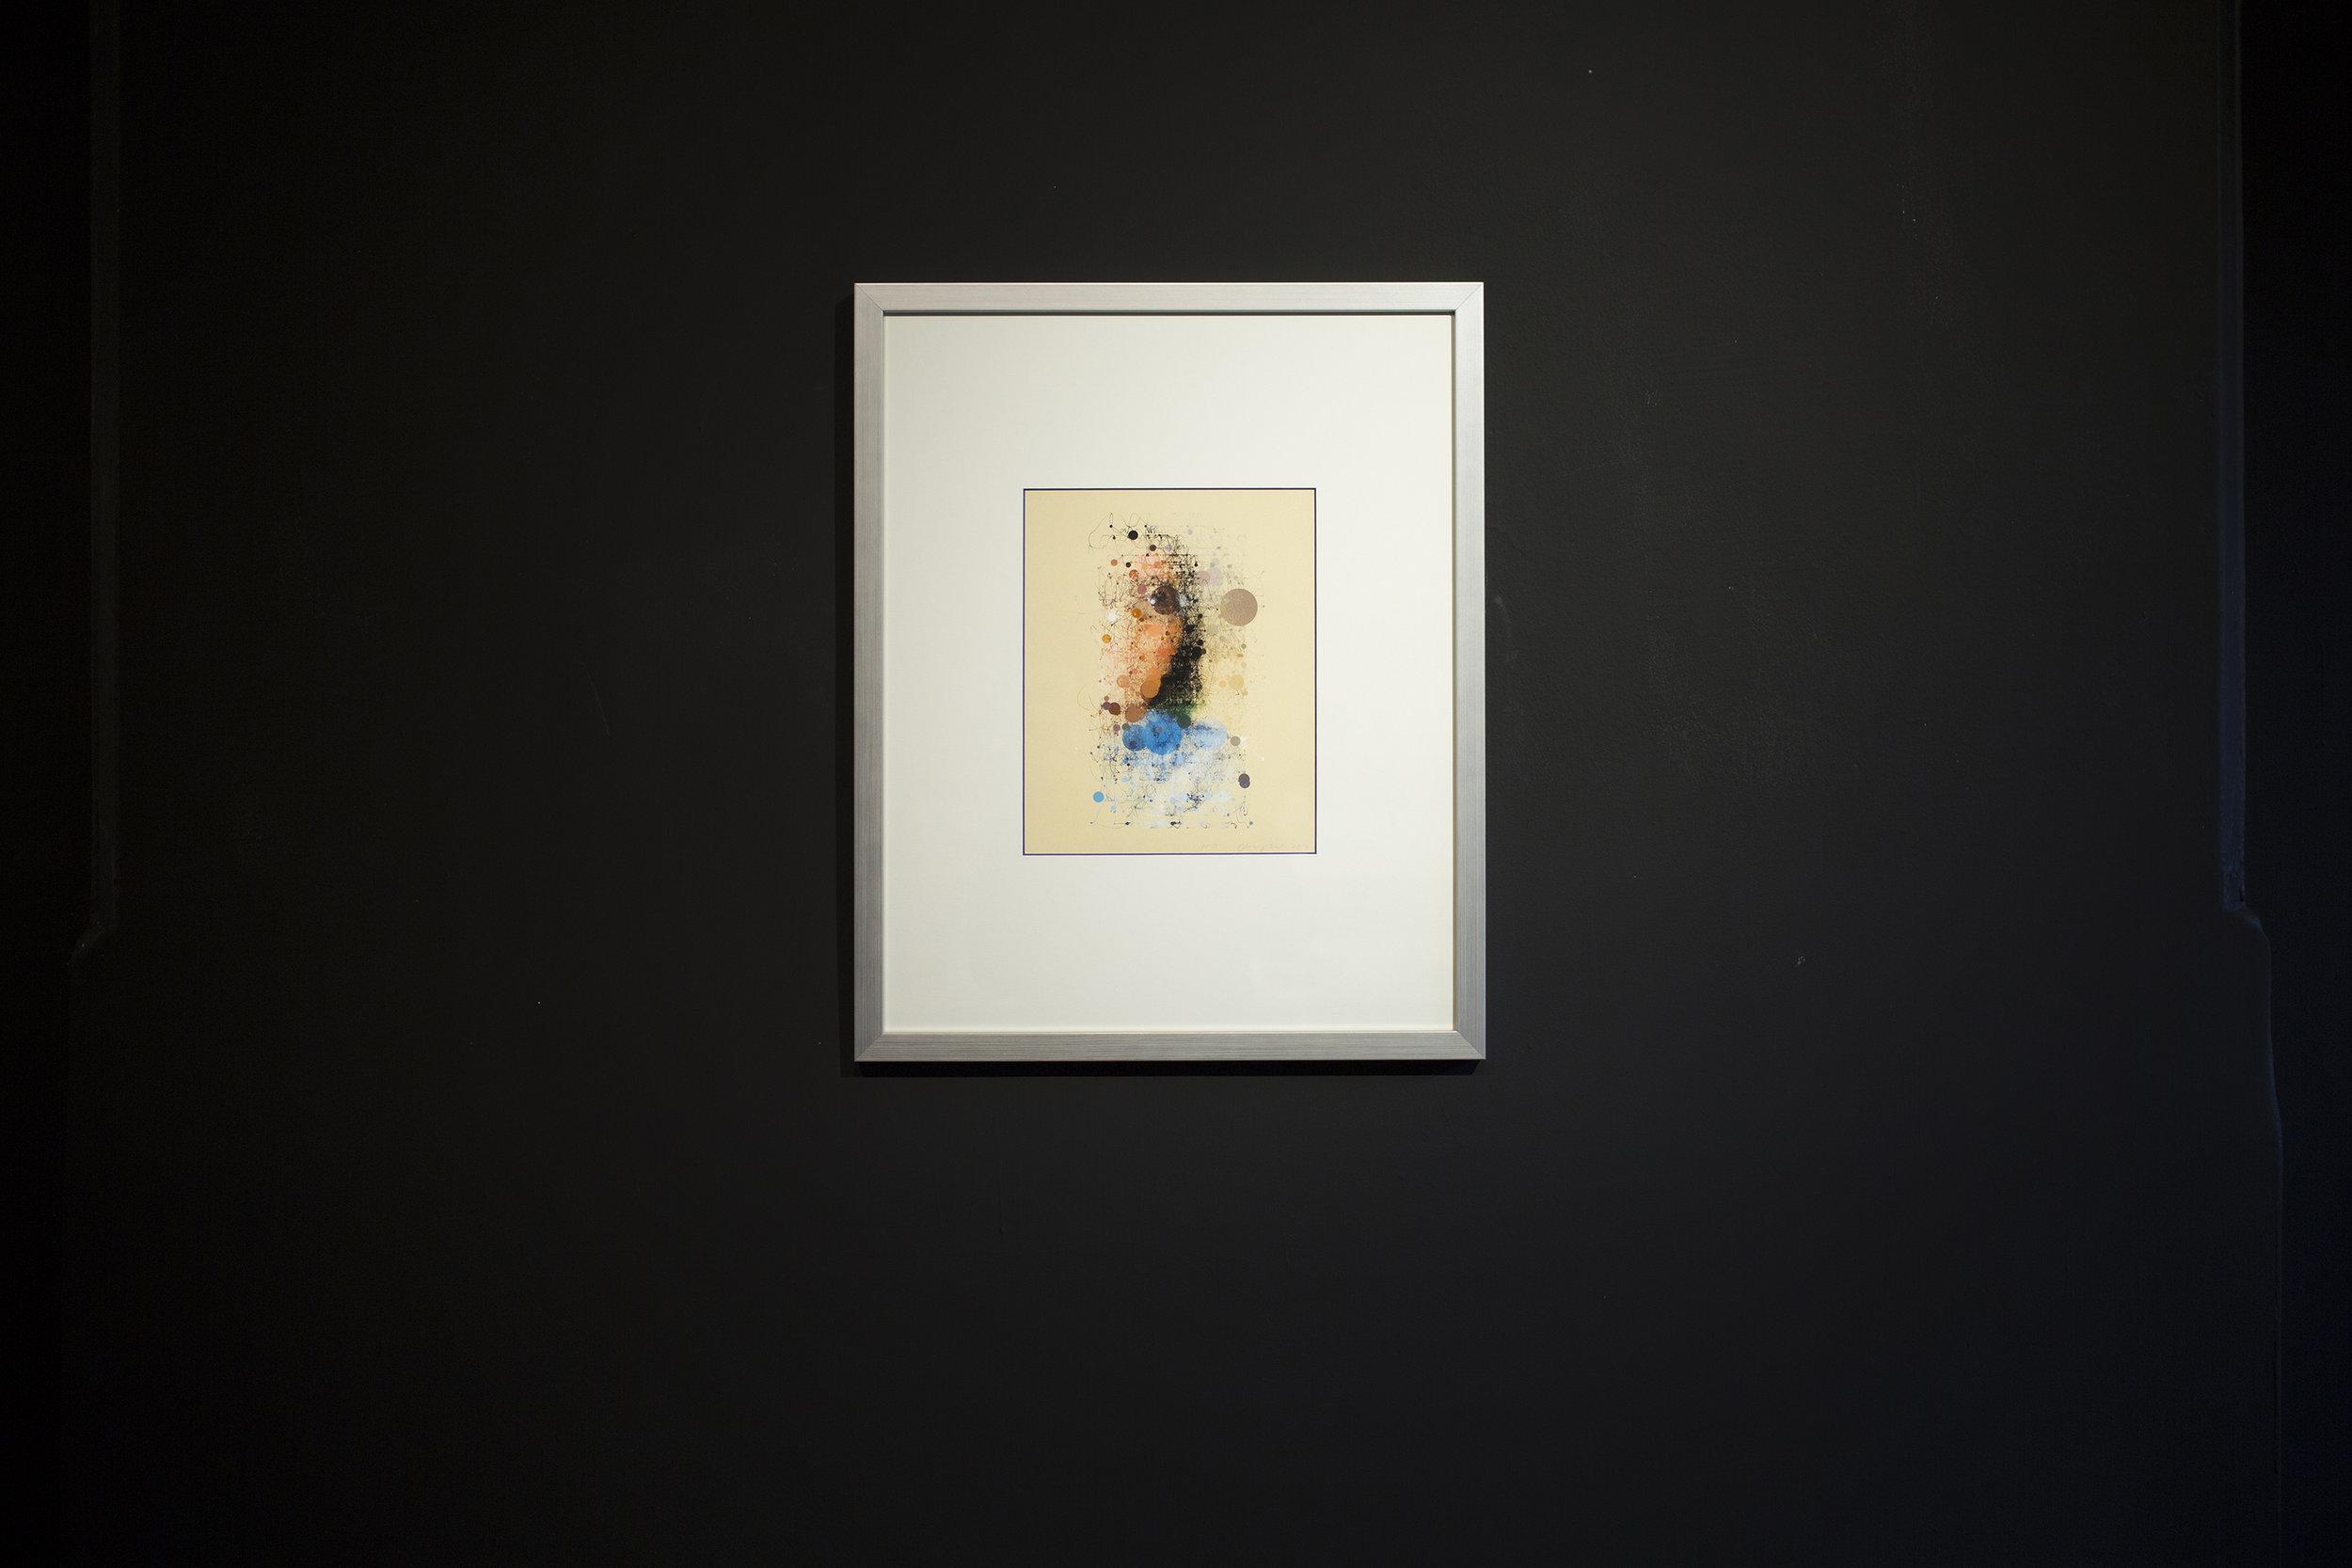 Random Walker,  10 x 8 inch w/o frame, archival print on Epson Ultra-smooth fine art paper.    随机漫步者   , 收藏级数码微喷   , 25.4 x 20.3 cm without frame    Frame  sponsed by Cloud Print